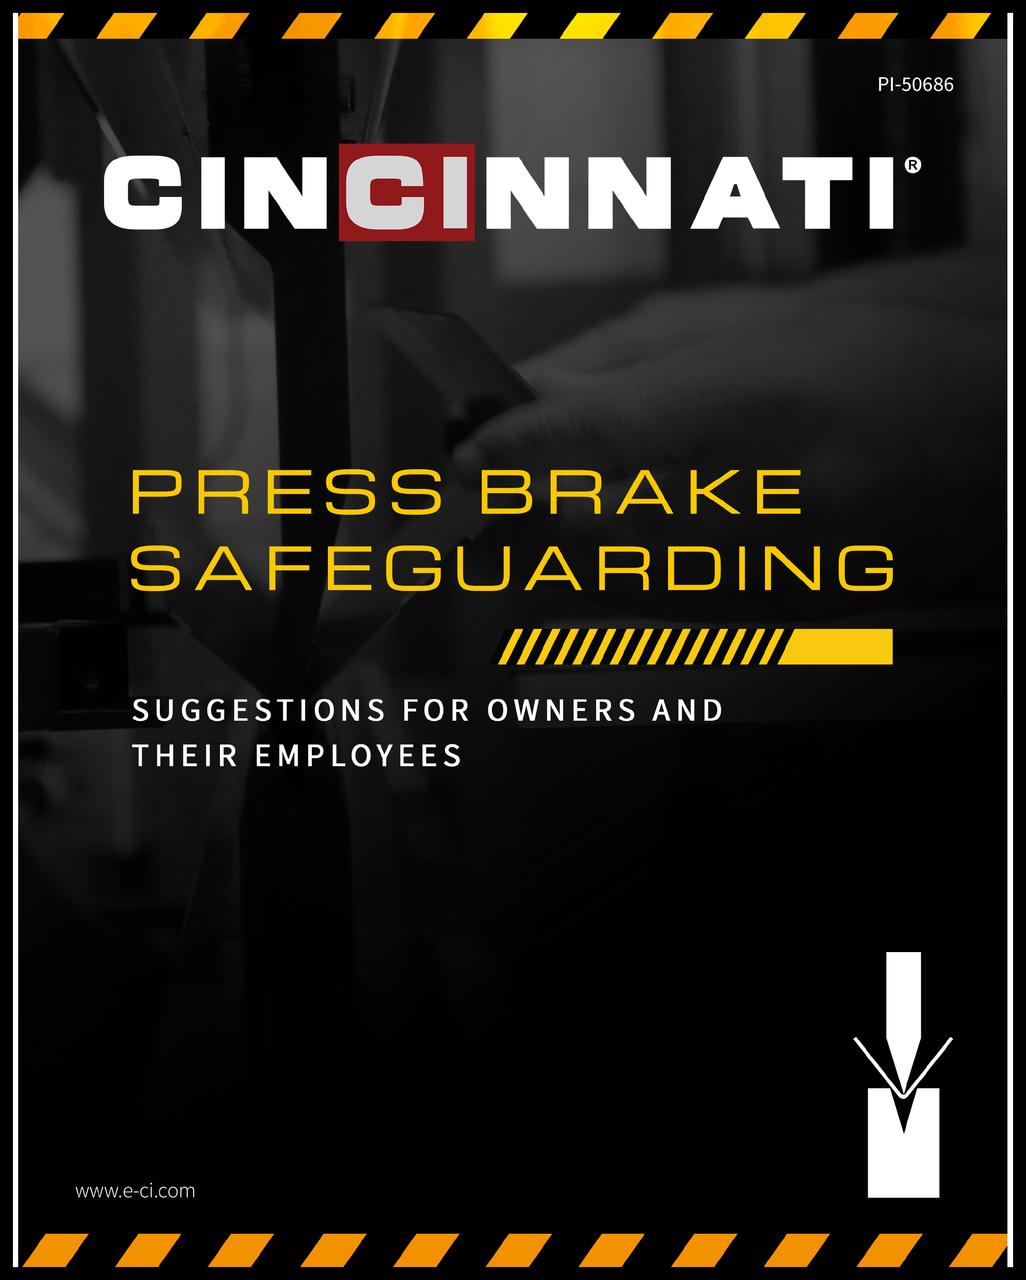 PI_50686_Press_Brake_Safeguarding_05-2016